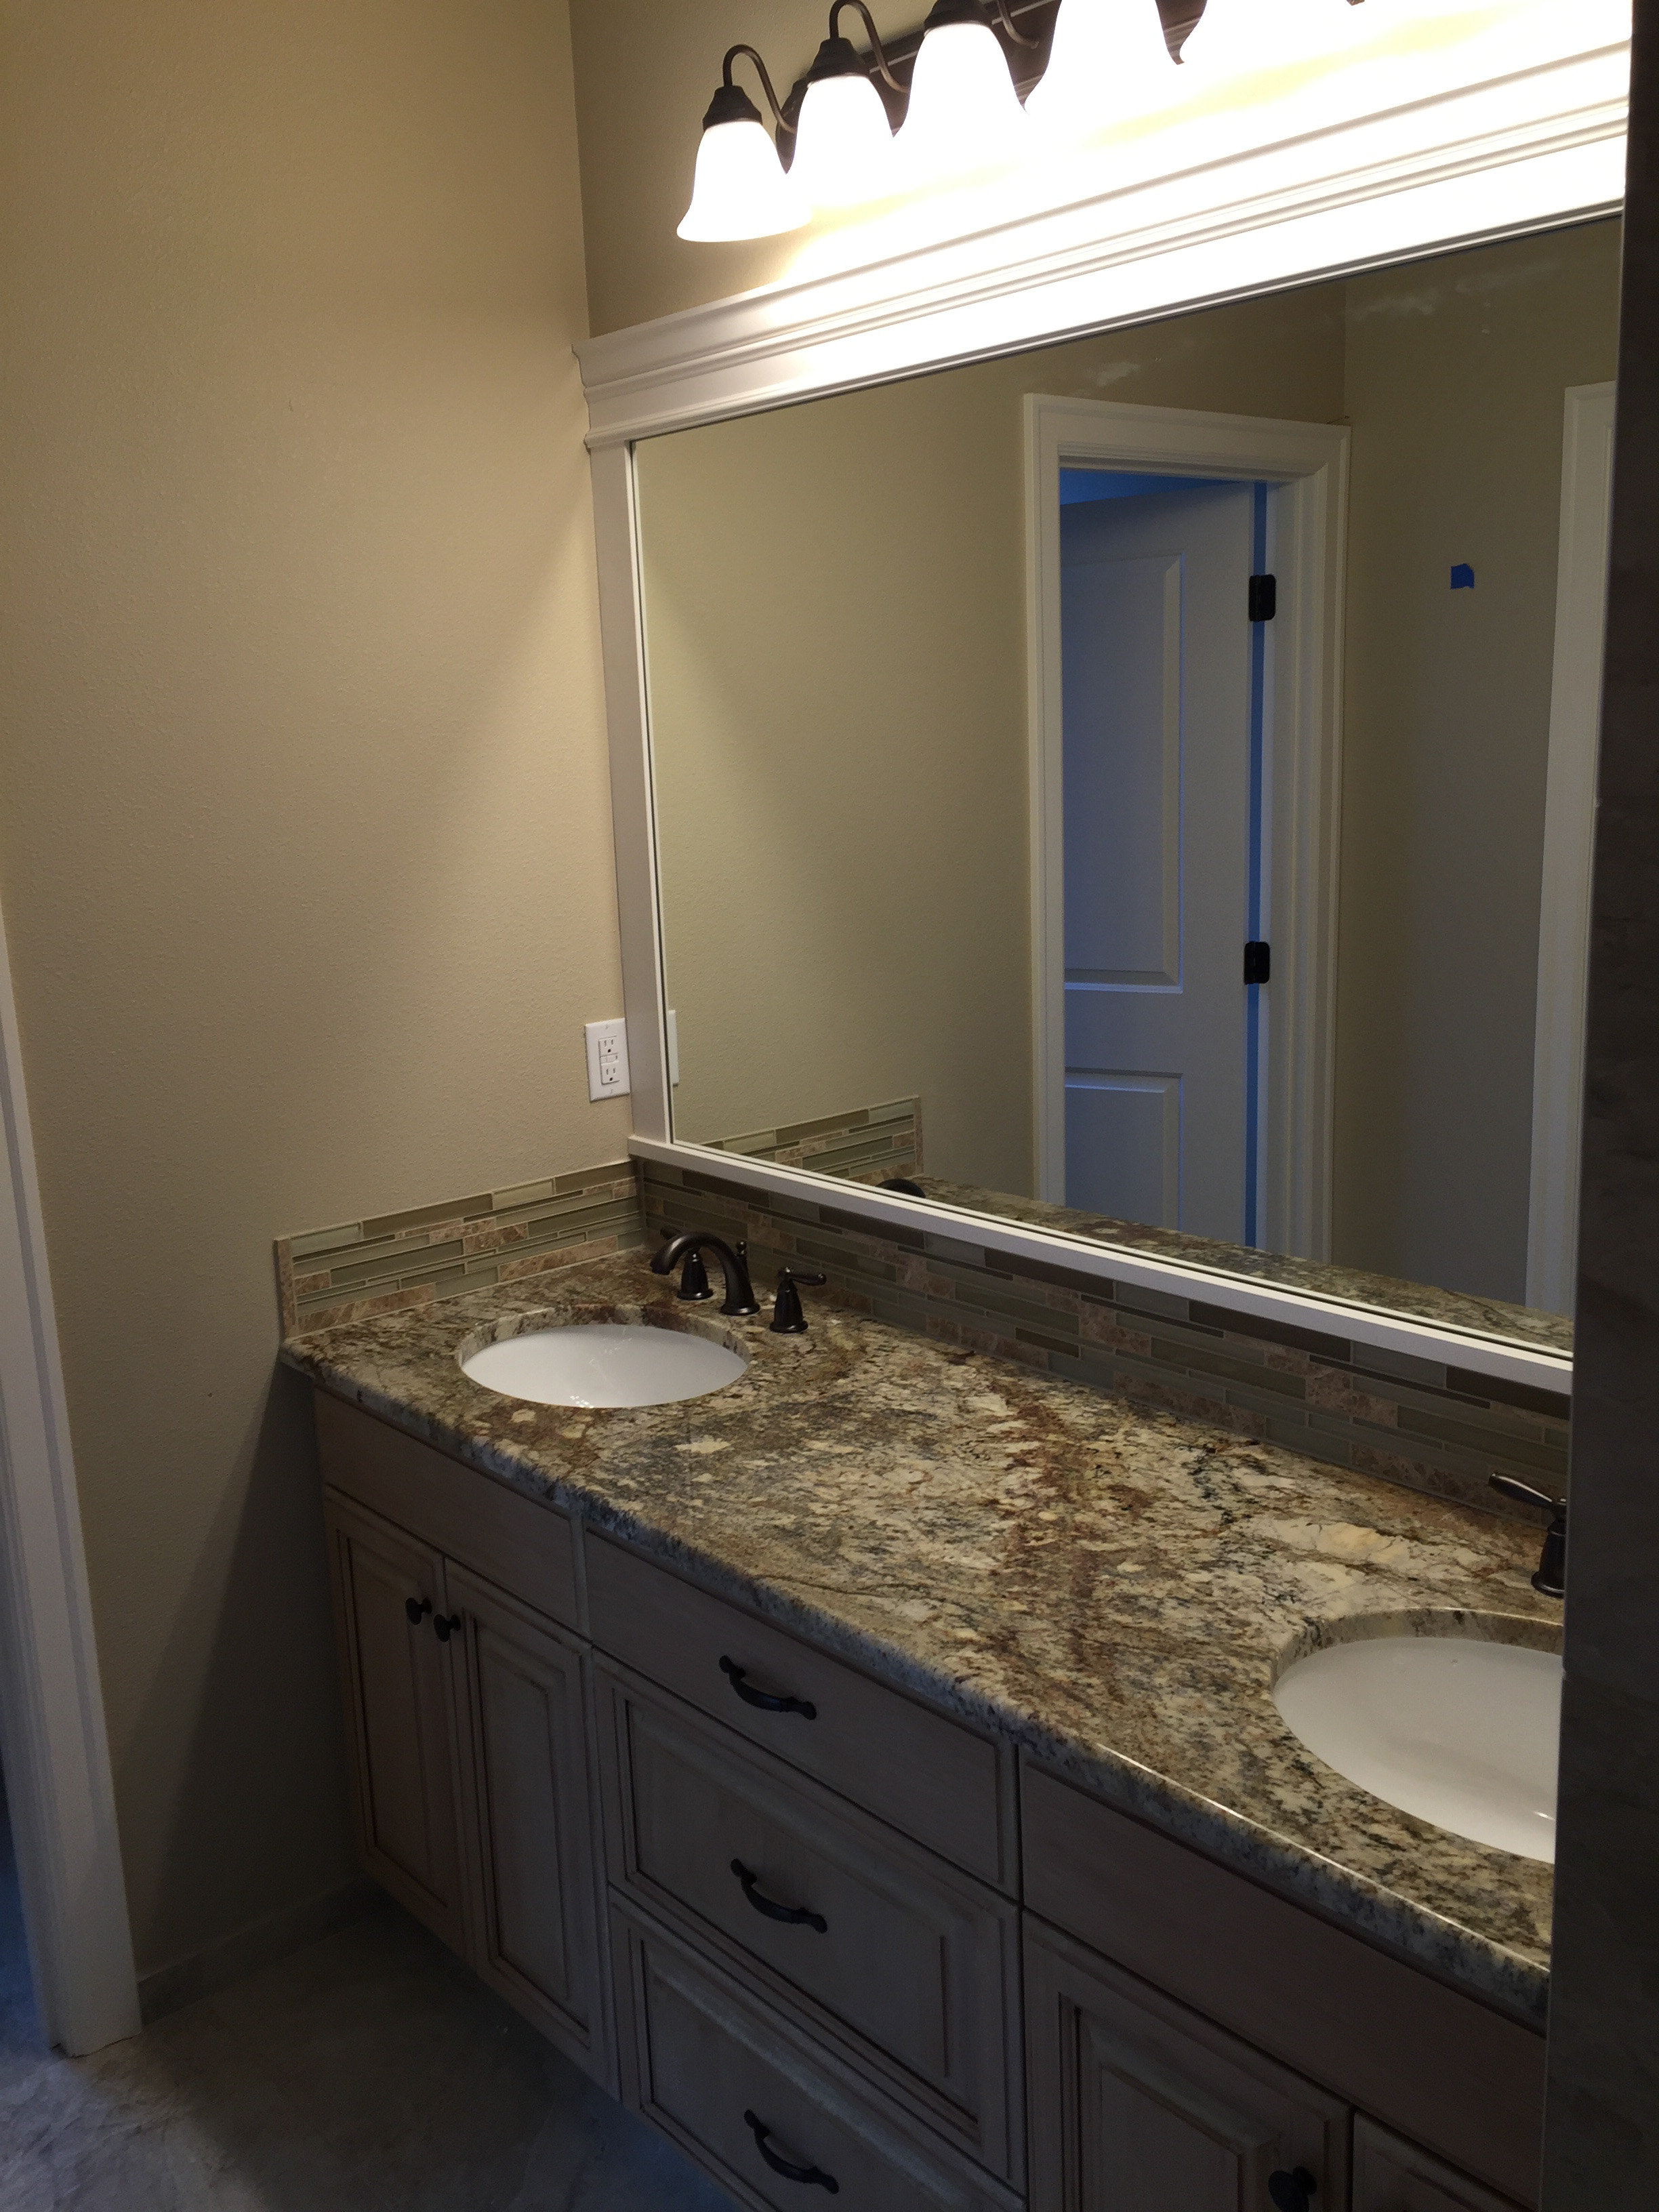 IMG_0722_edited Bathroom Counter photo